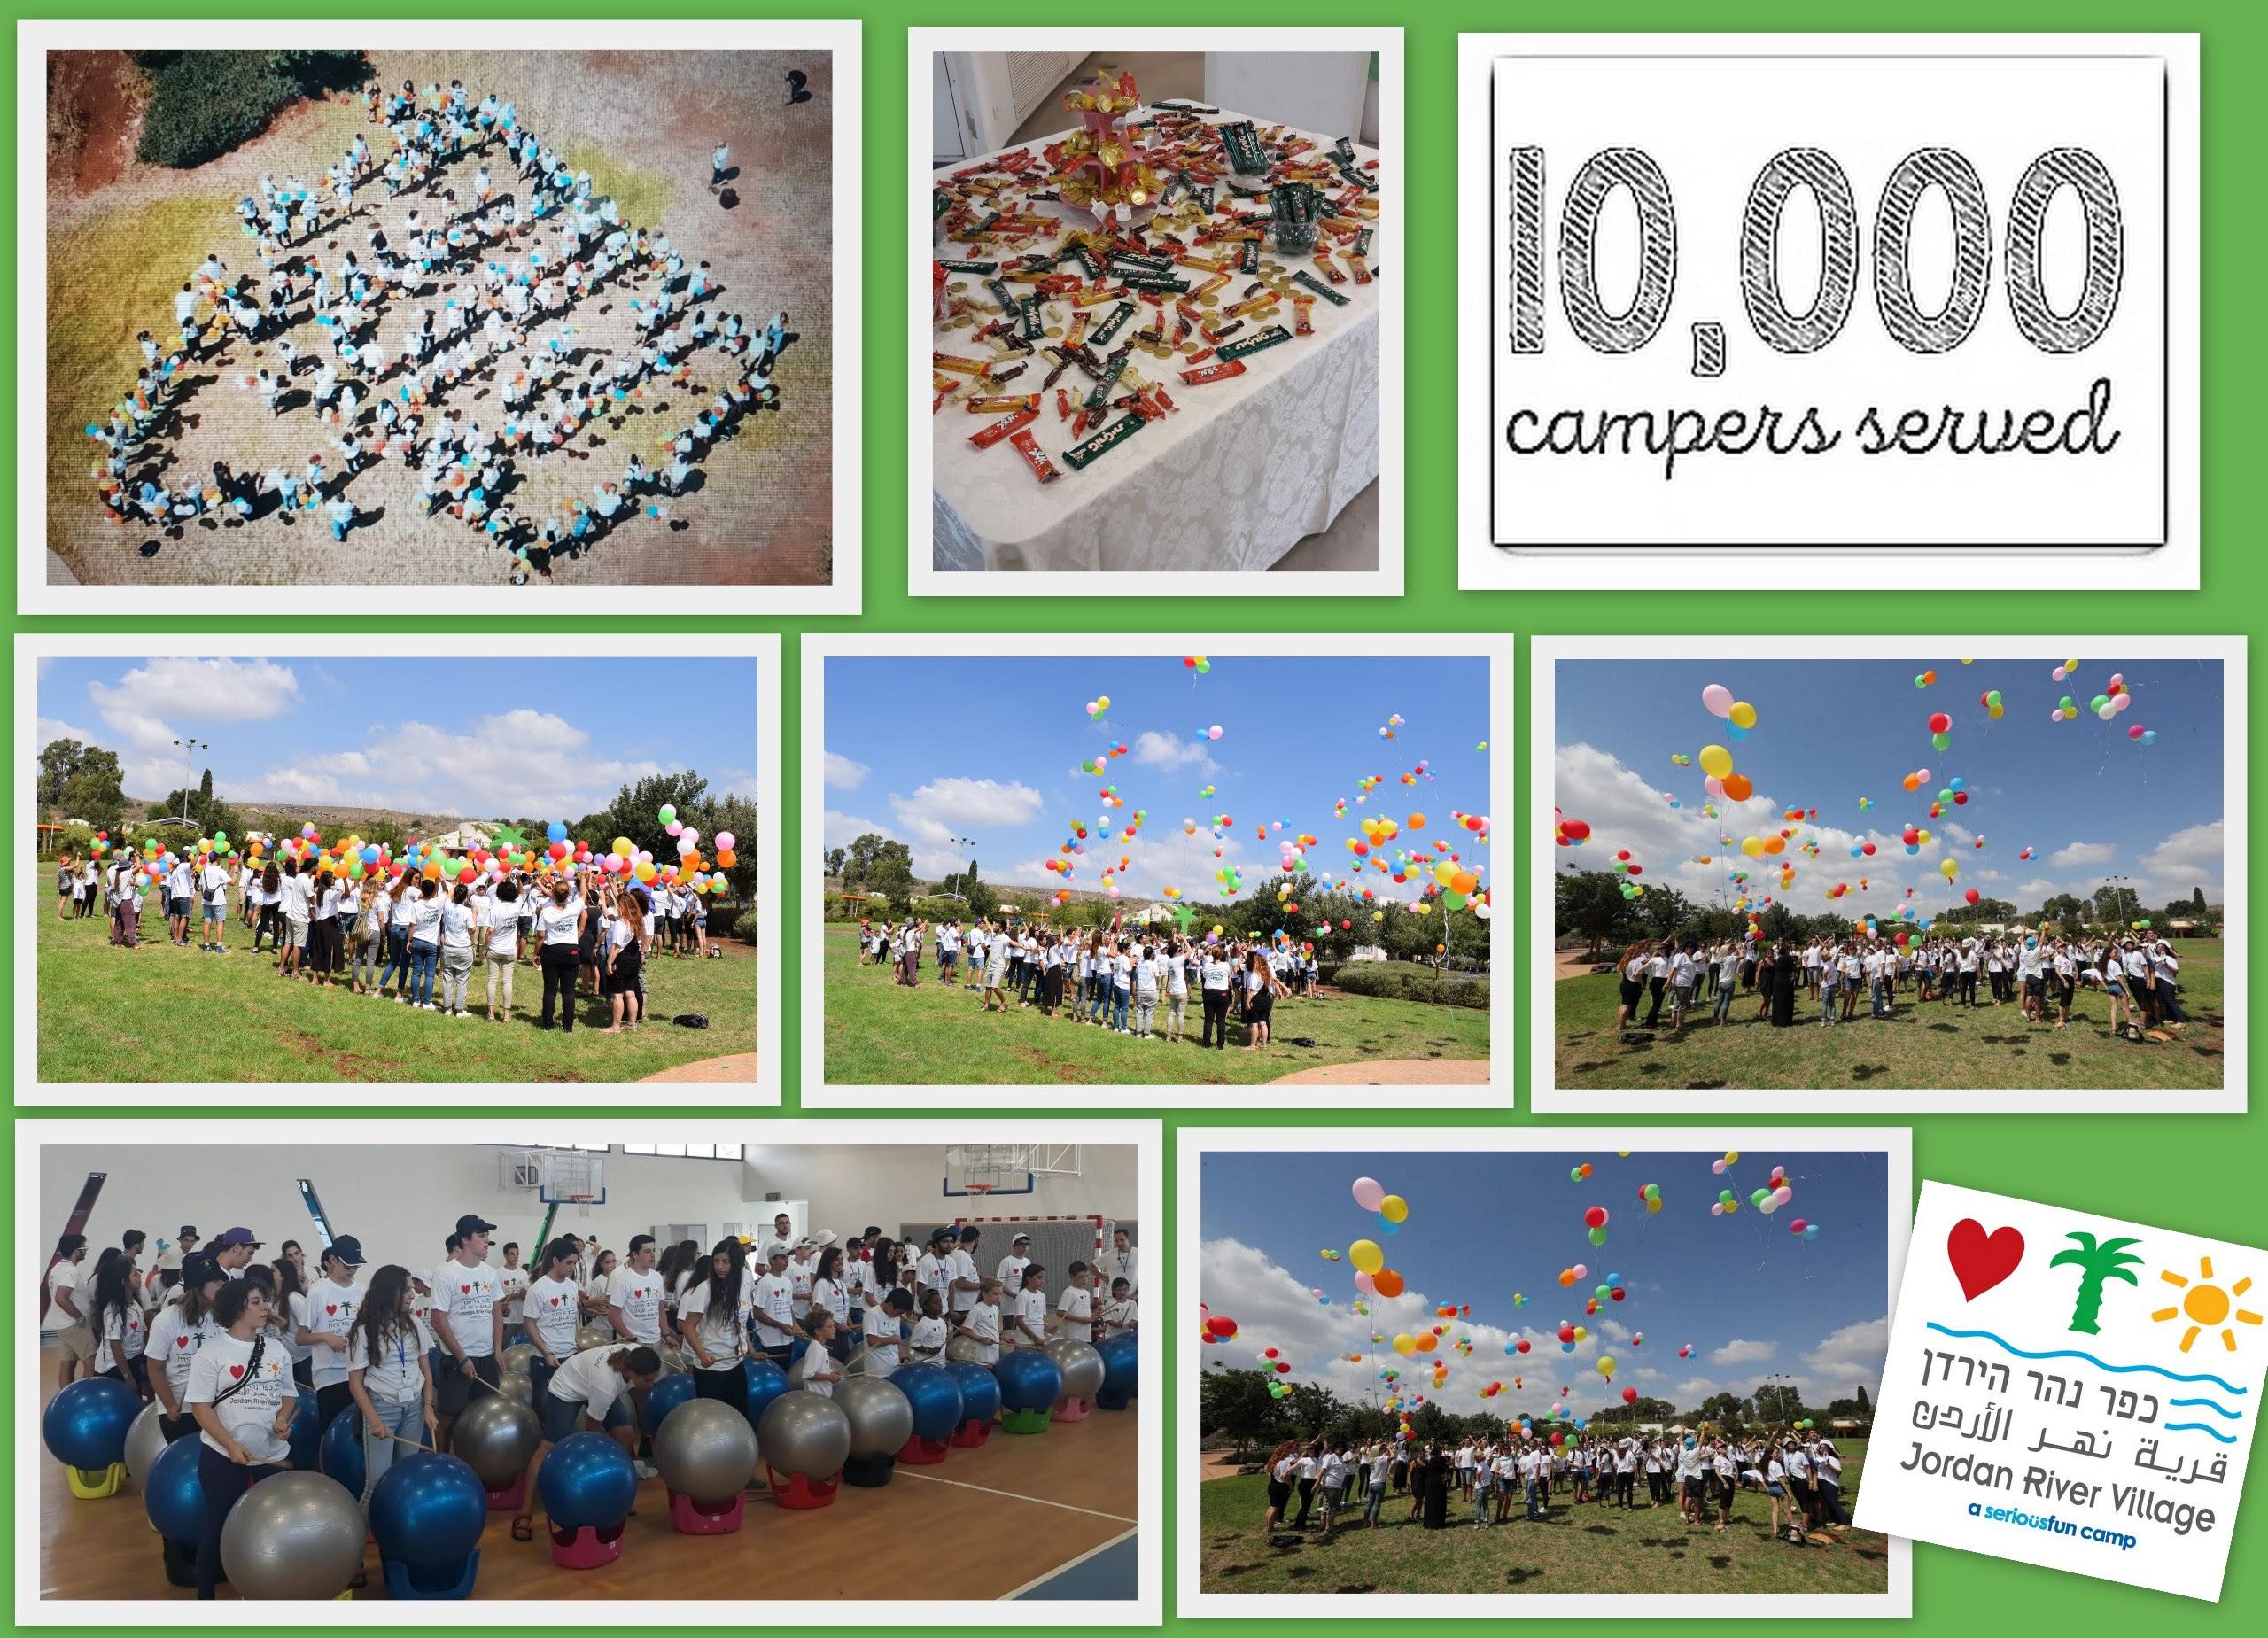 10000 campers served